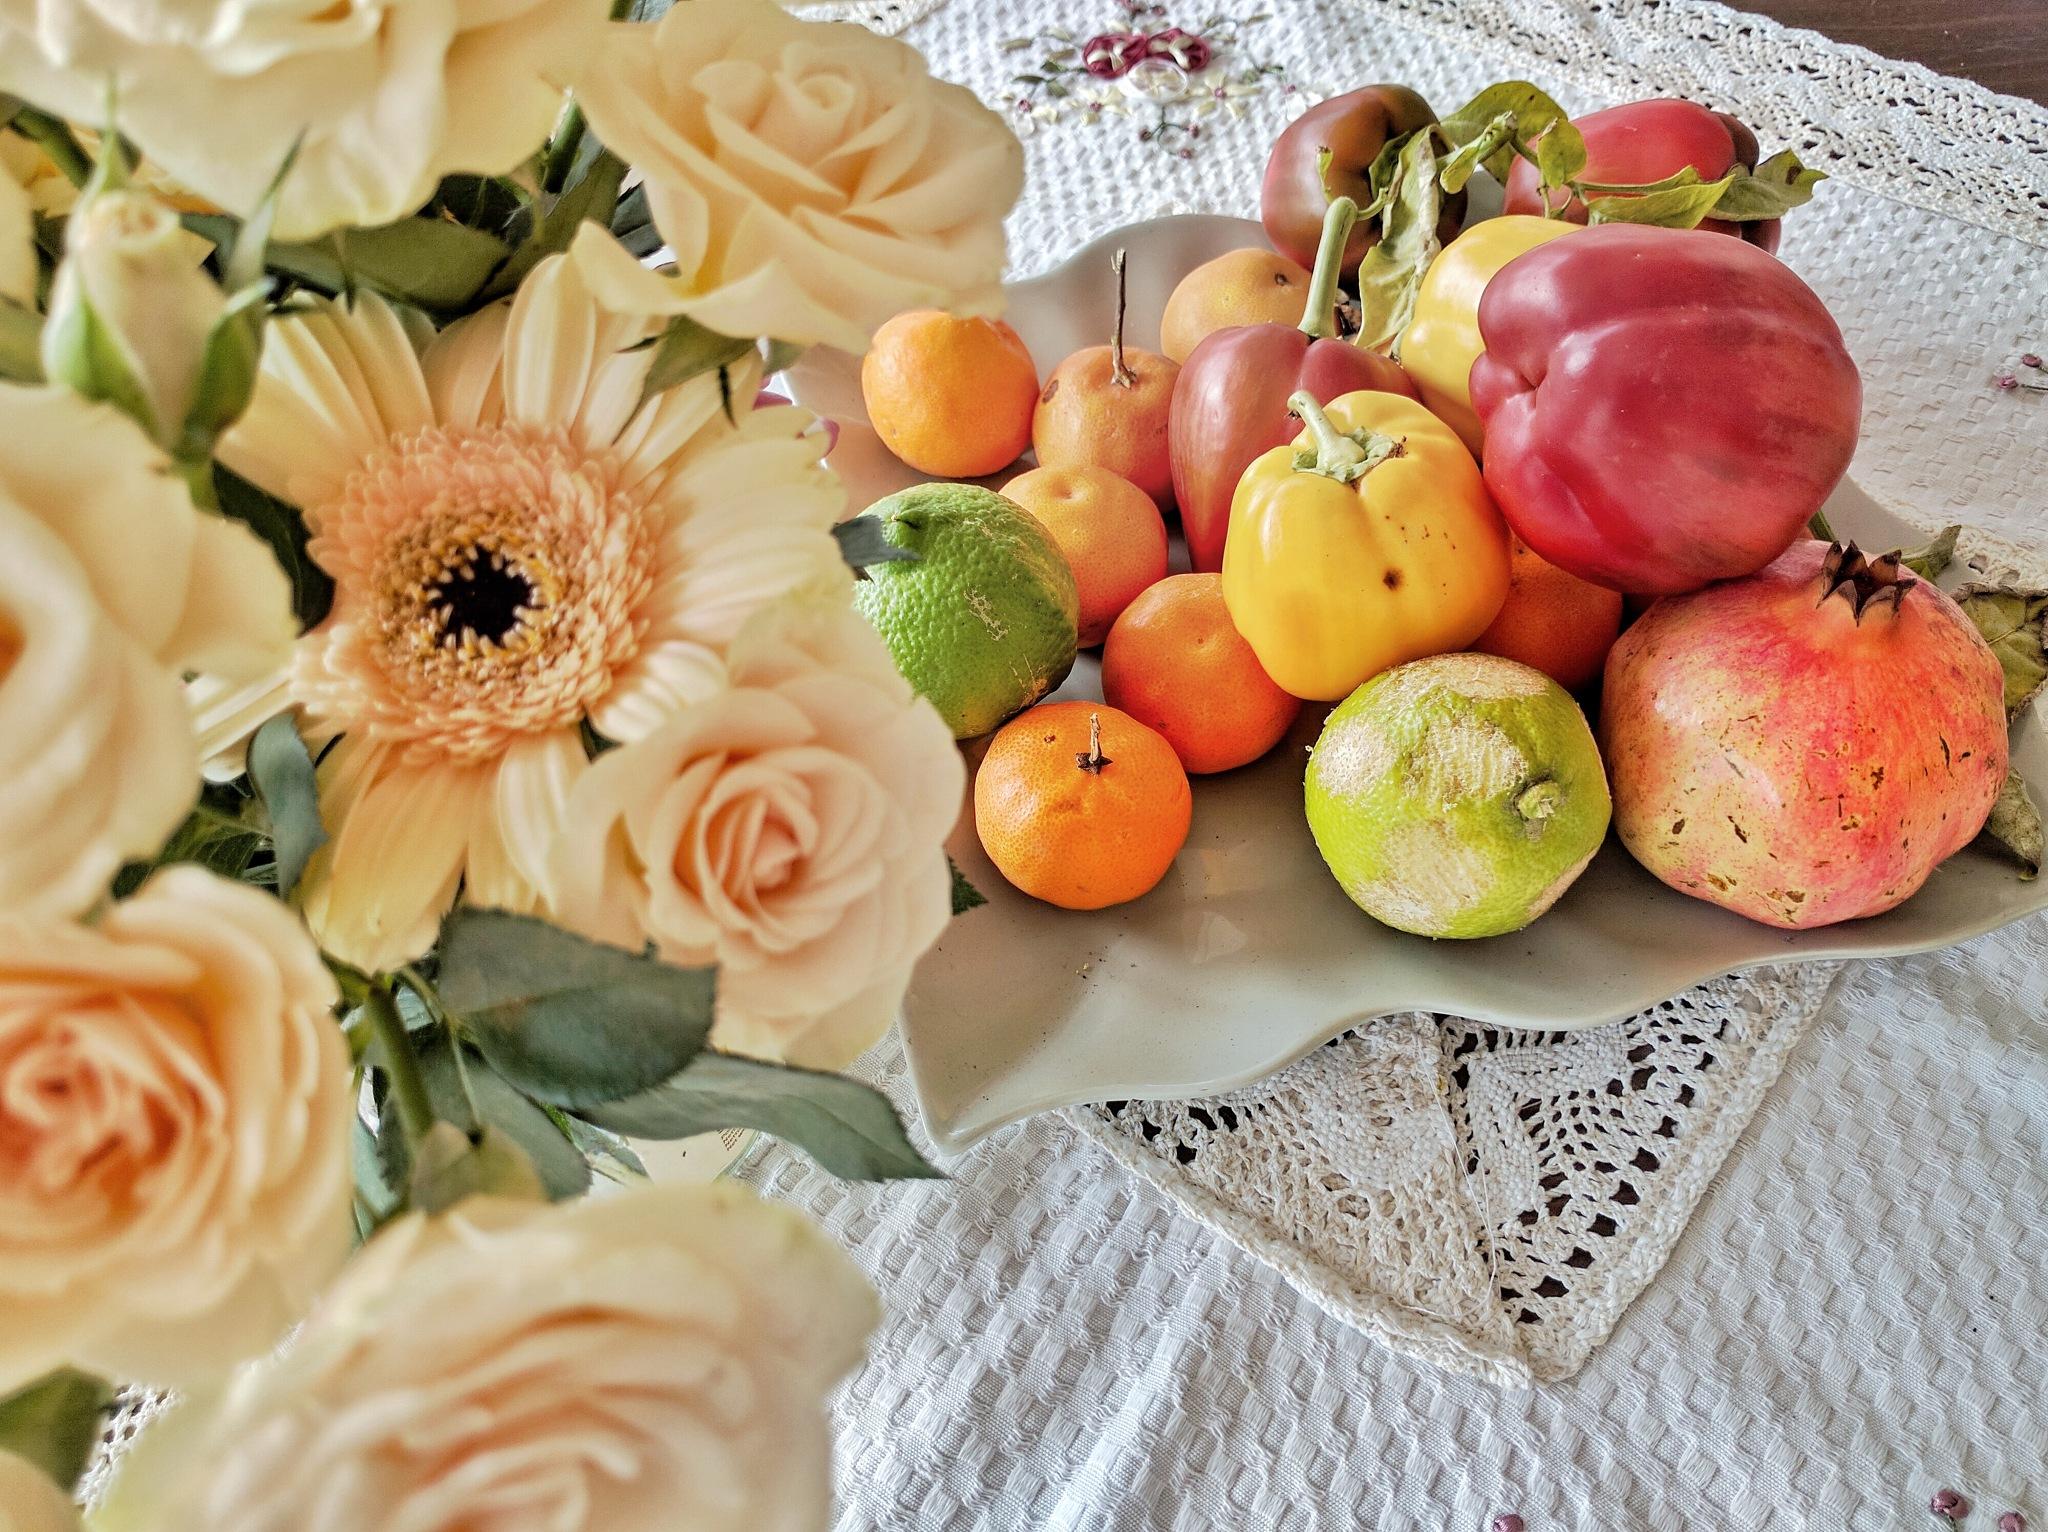 Flowers & fruits by vasilis fragiskatos